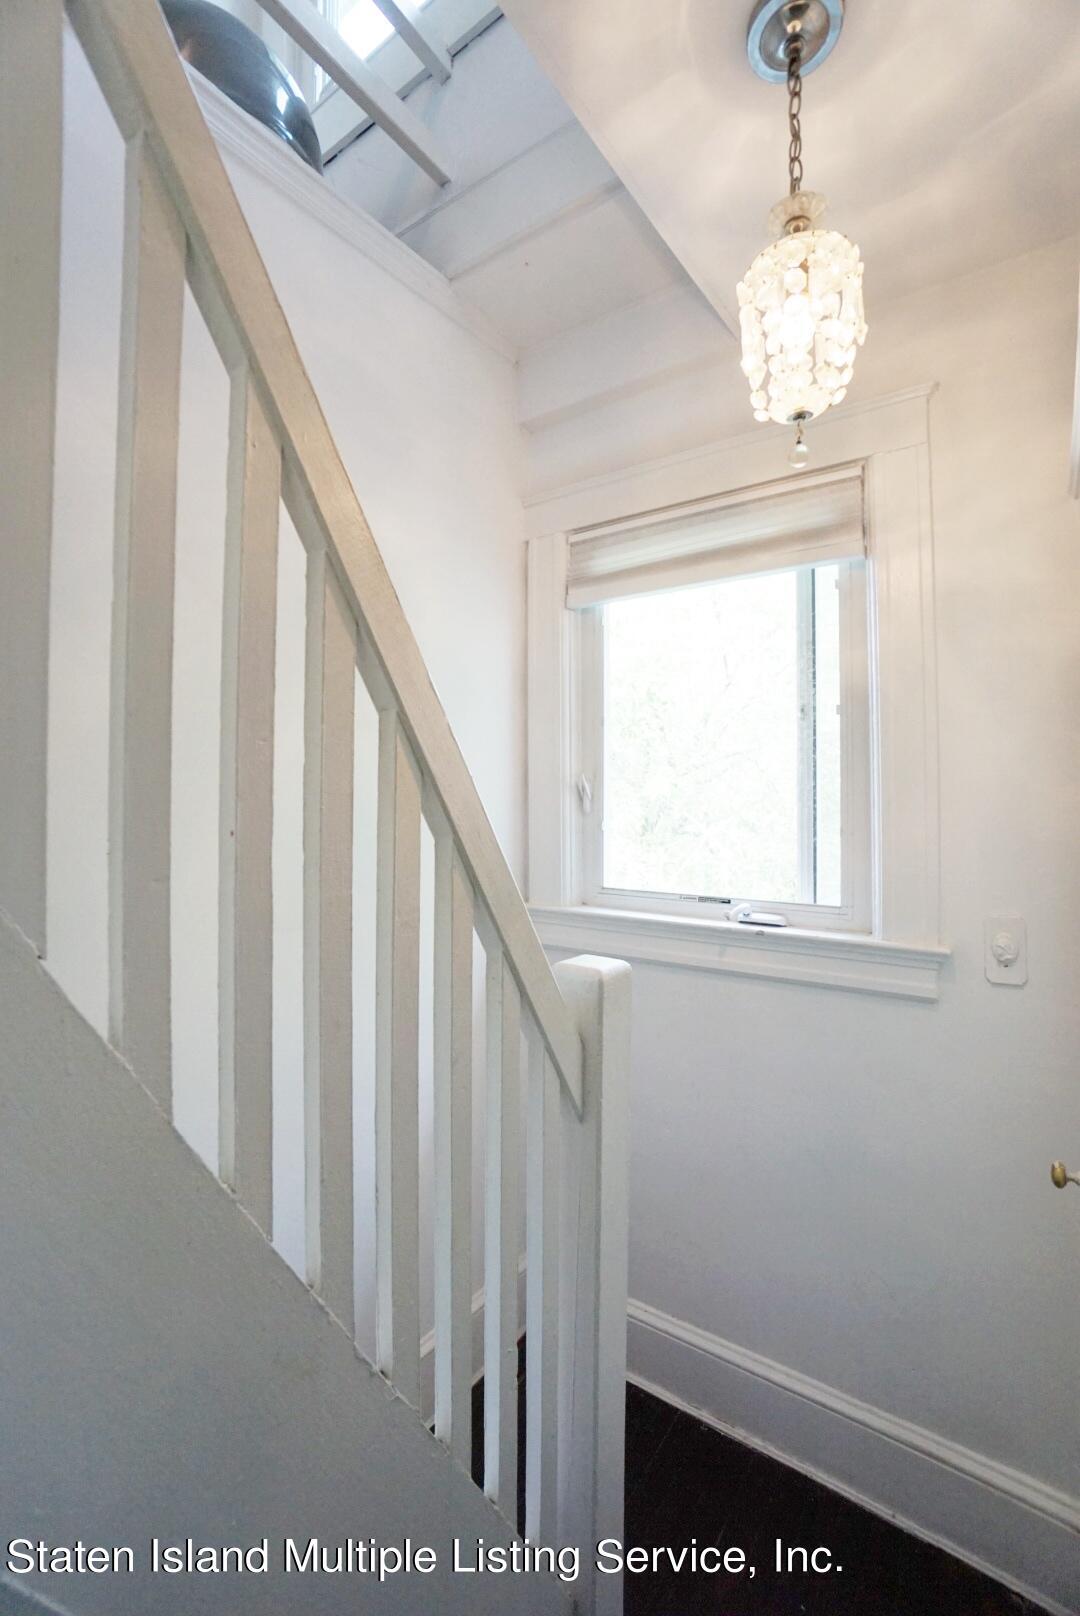 Single Family - Detached 311 Bement Avenue  Staten Island, NY 10310, MLS-1147133-30